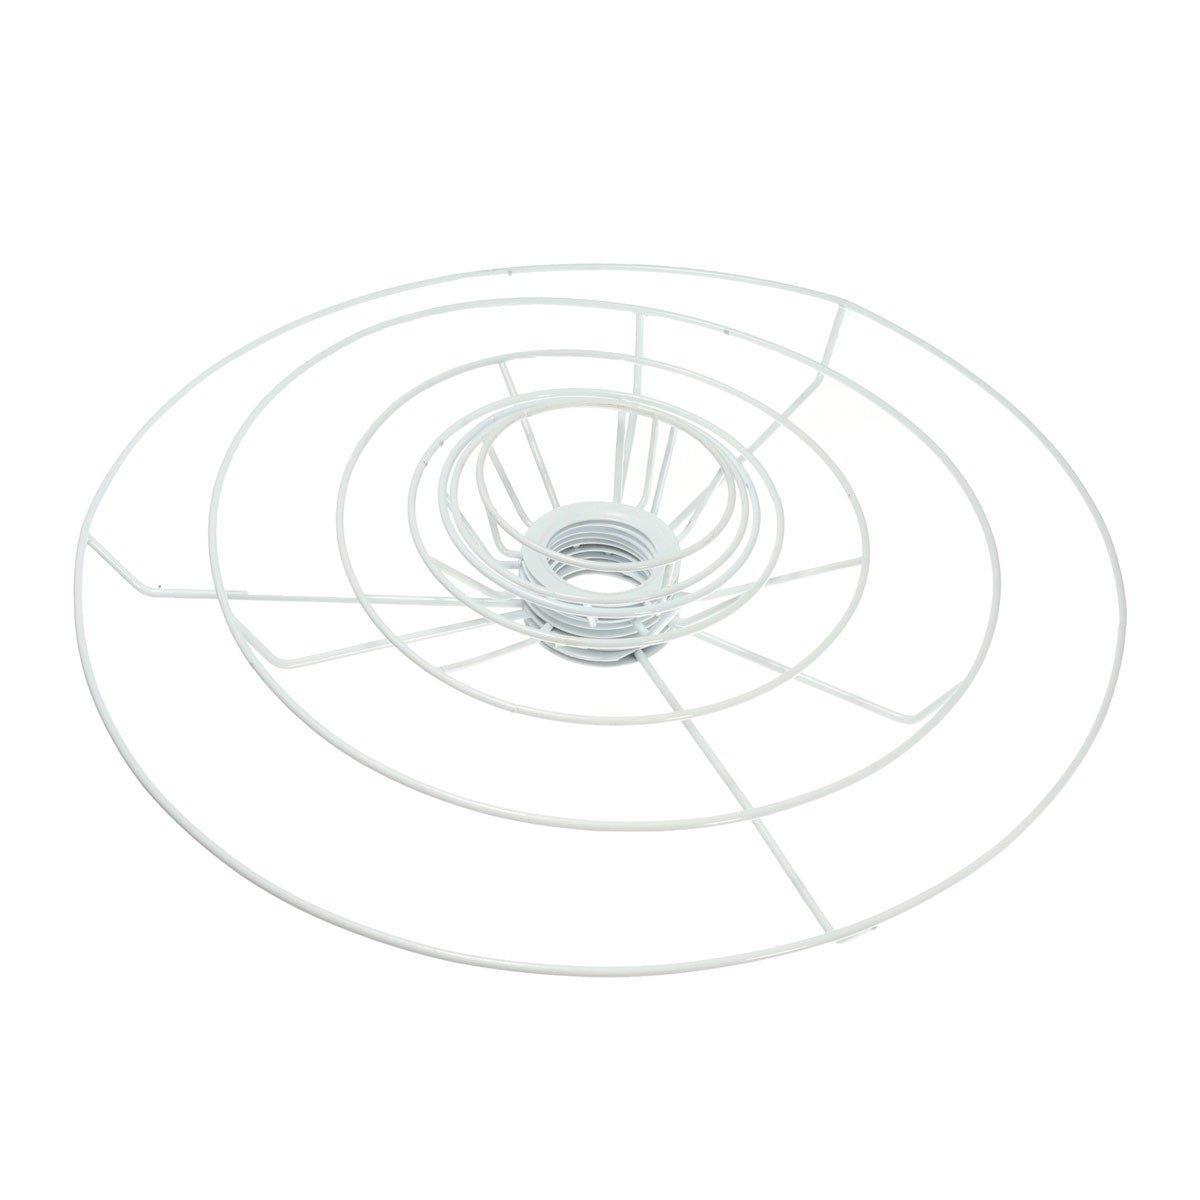 JCHUNL E27 9,5-40 cm Rund Lampenschirmrahmen Ring Set Lampe Licht Schatten DIY Kit Hot (Farbe   11cm)